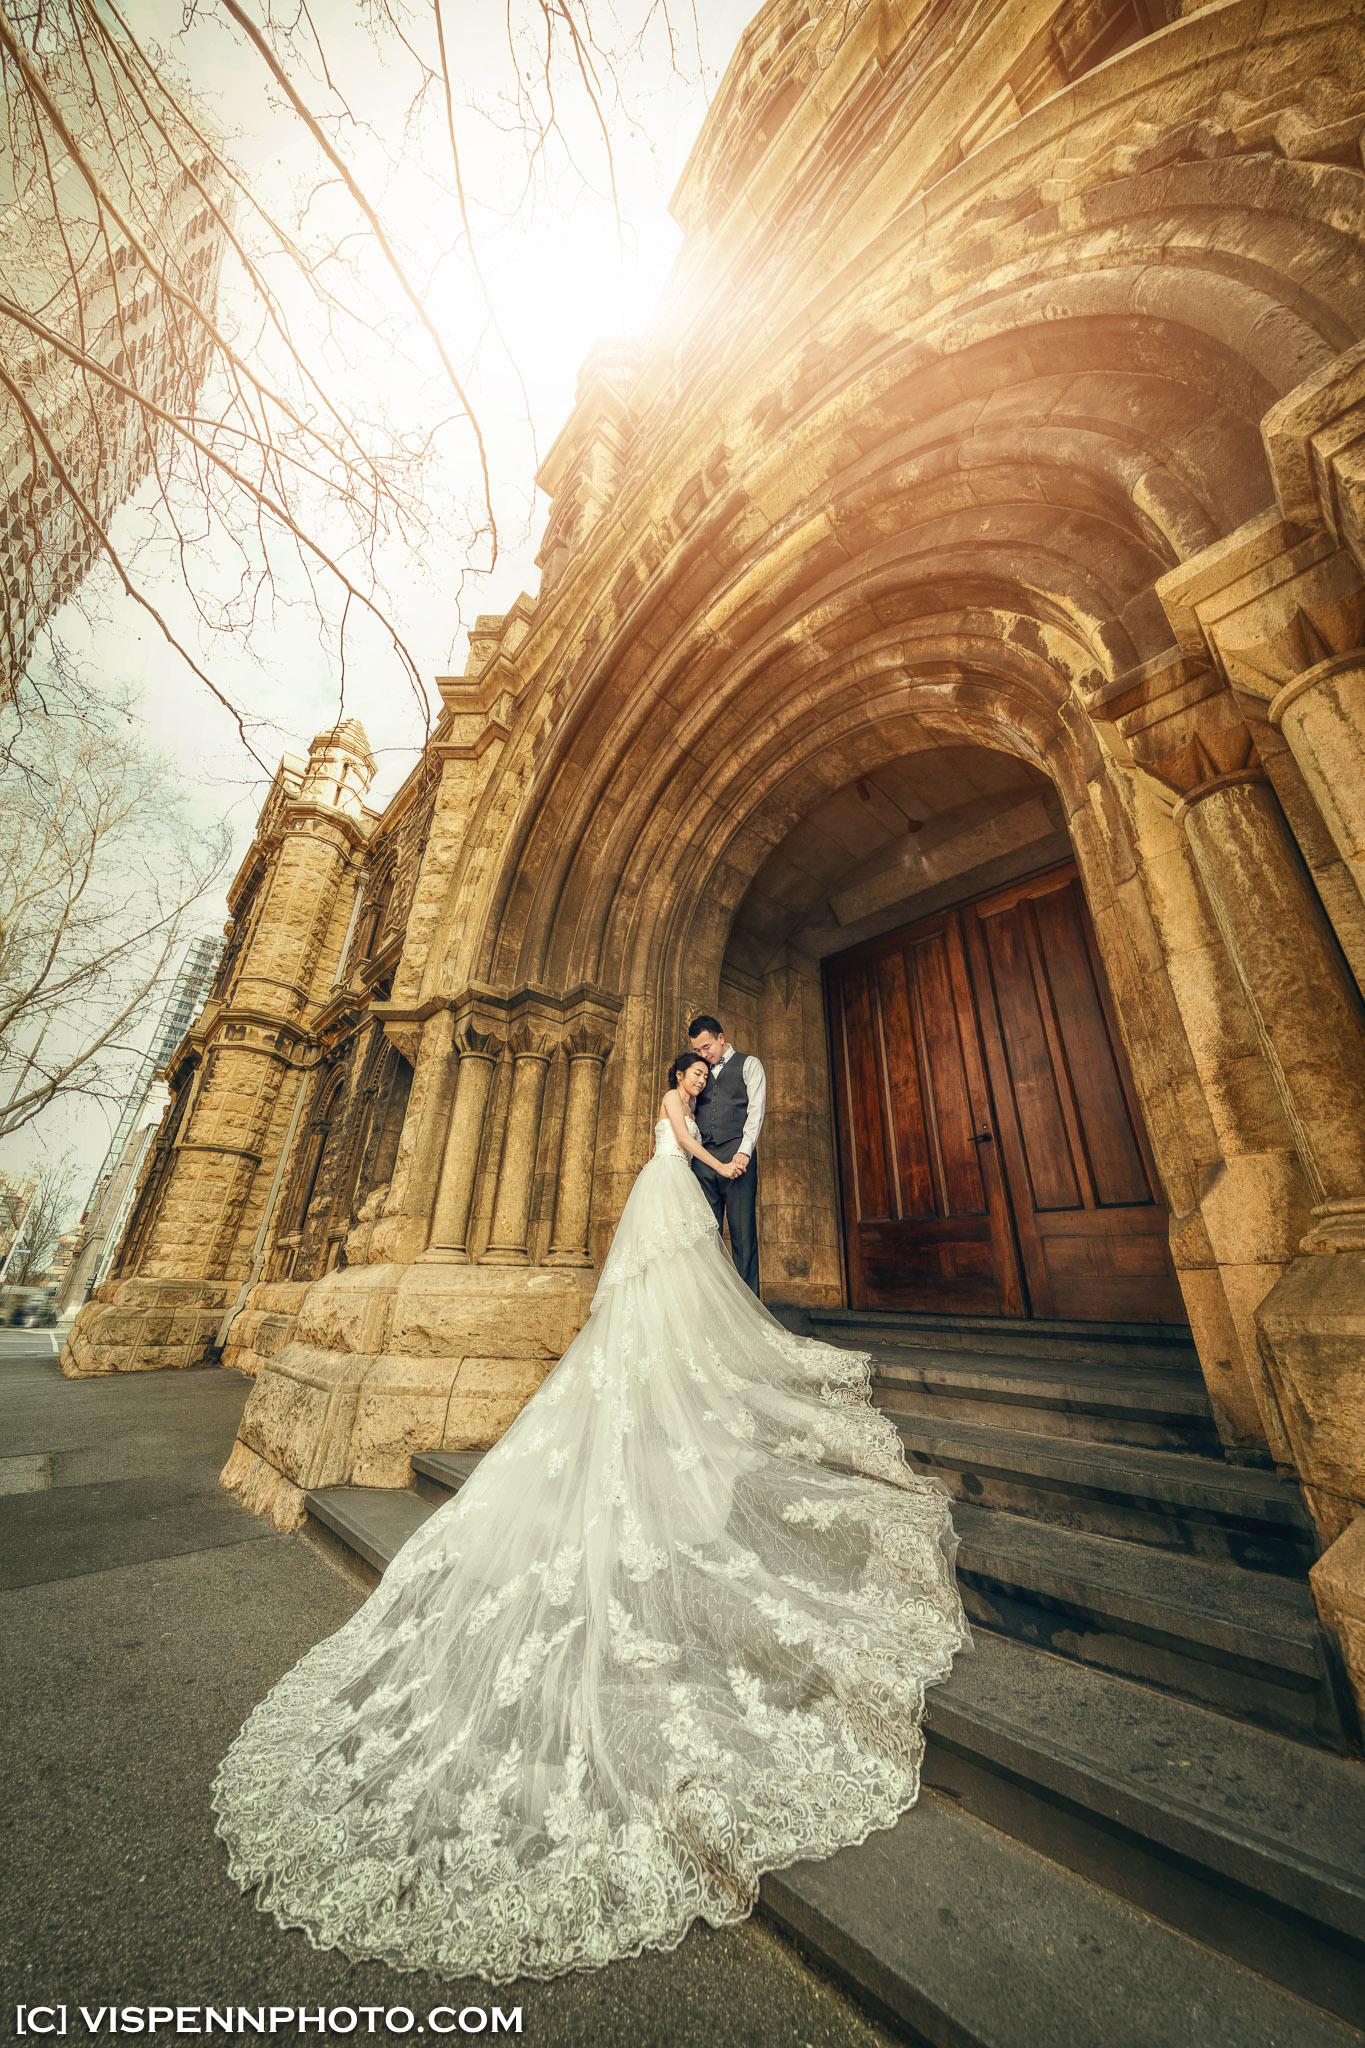 PRE WEDDING Photography Melbourne VISPENN 墨尔本 婚纱照 结婚照 婚纱摄影 VISPENN XXD 3603 1